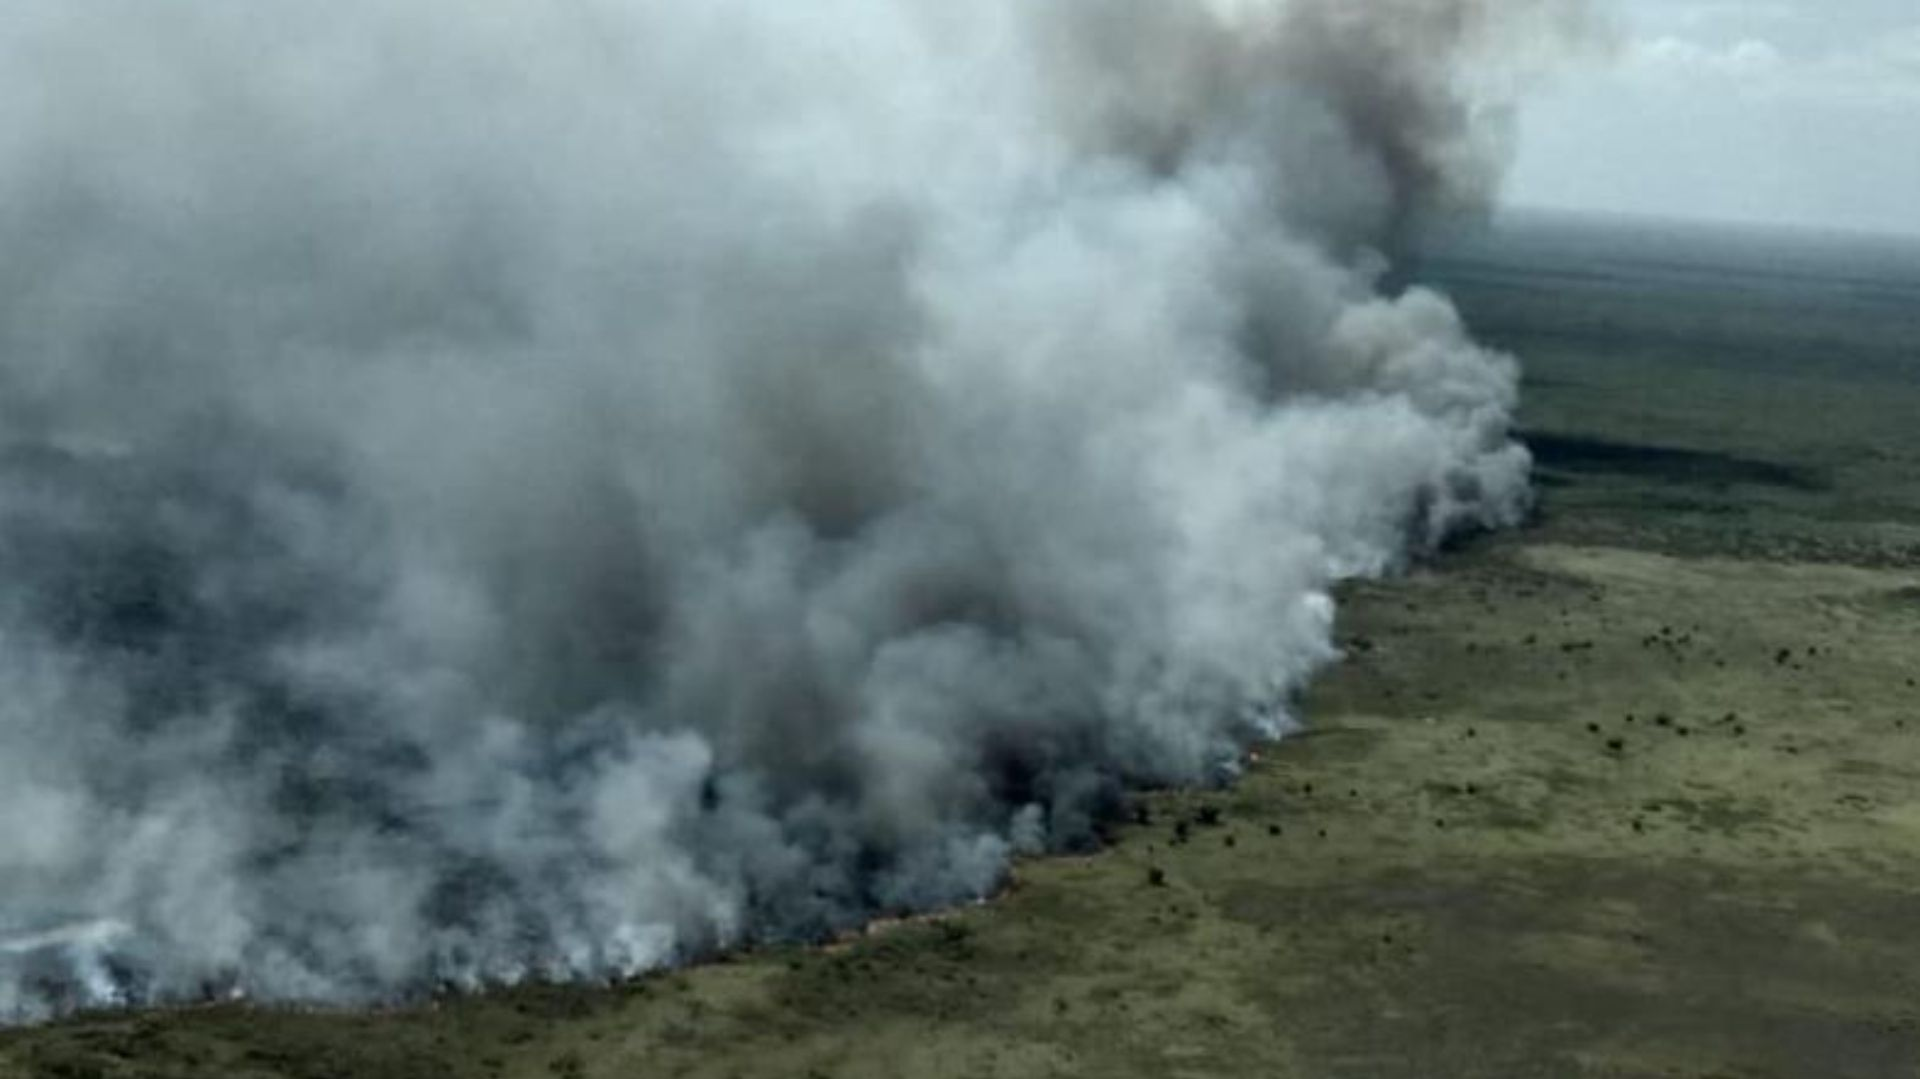 Dos incendios han afectado parte de la biosfera de Sian Ka'an (Foto: @CONANP_mx)